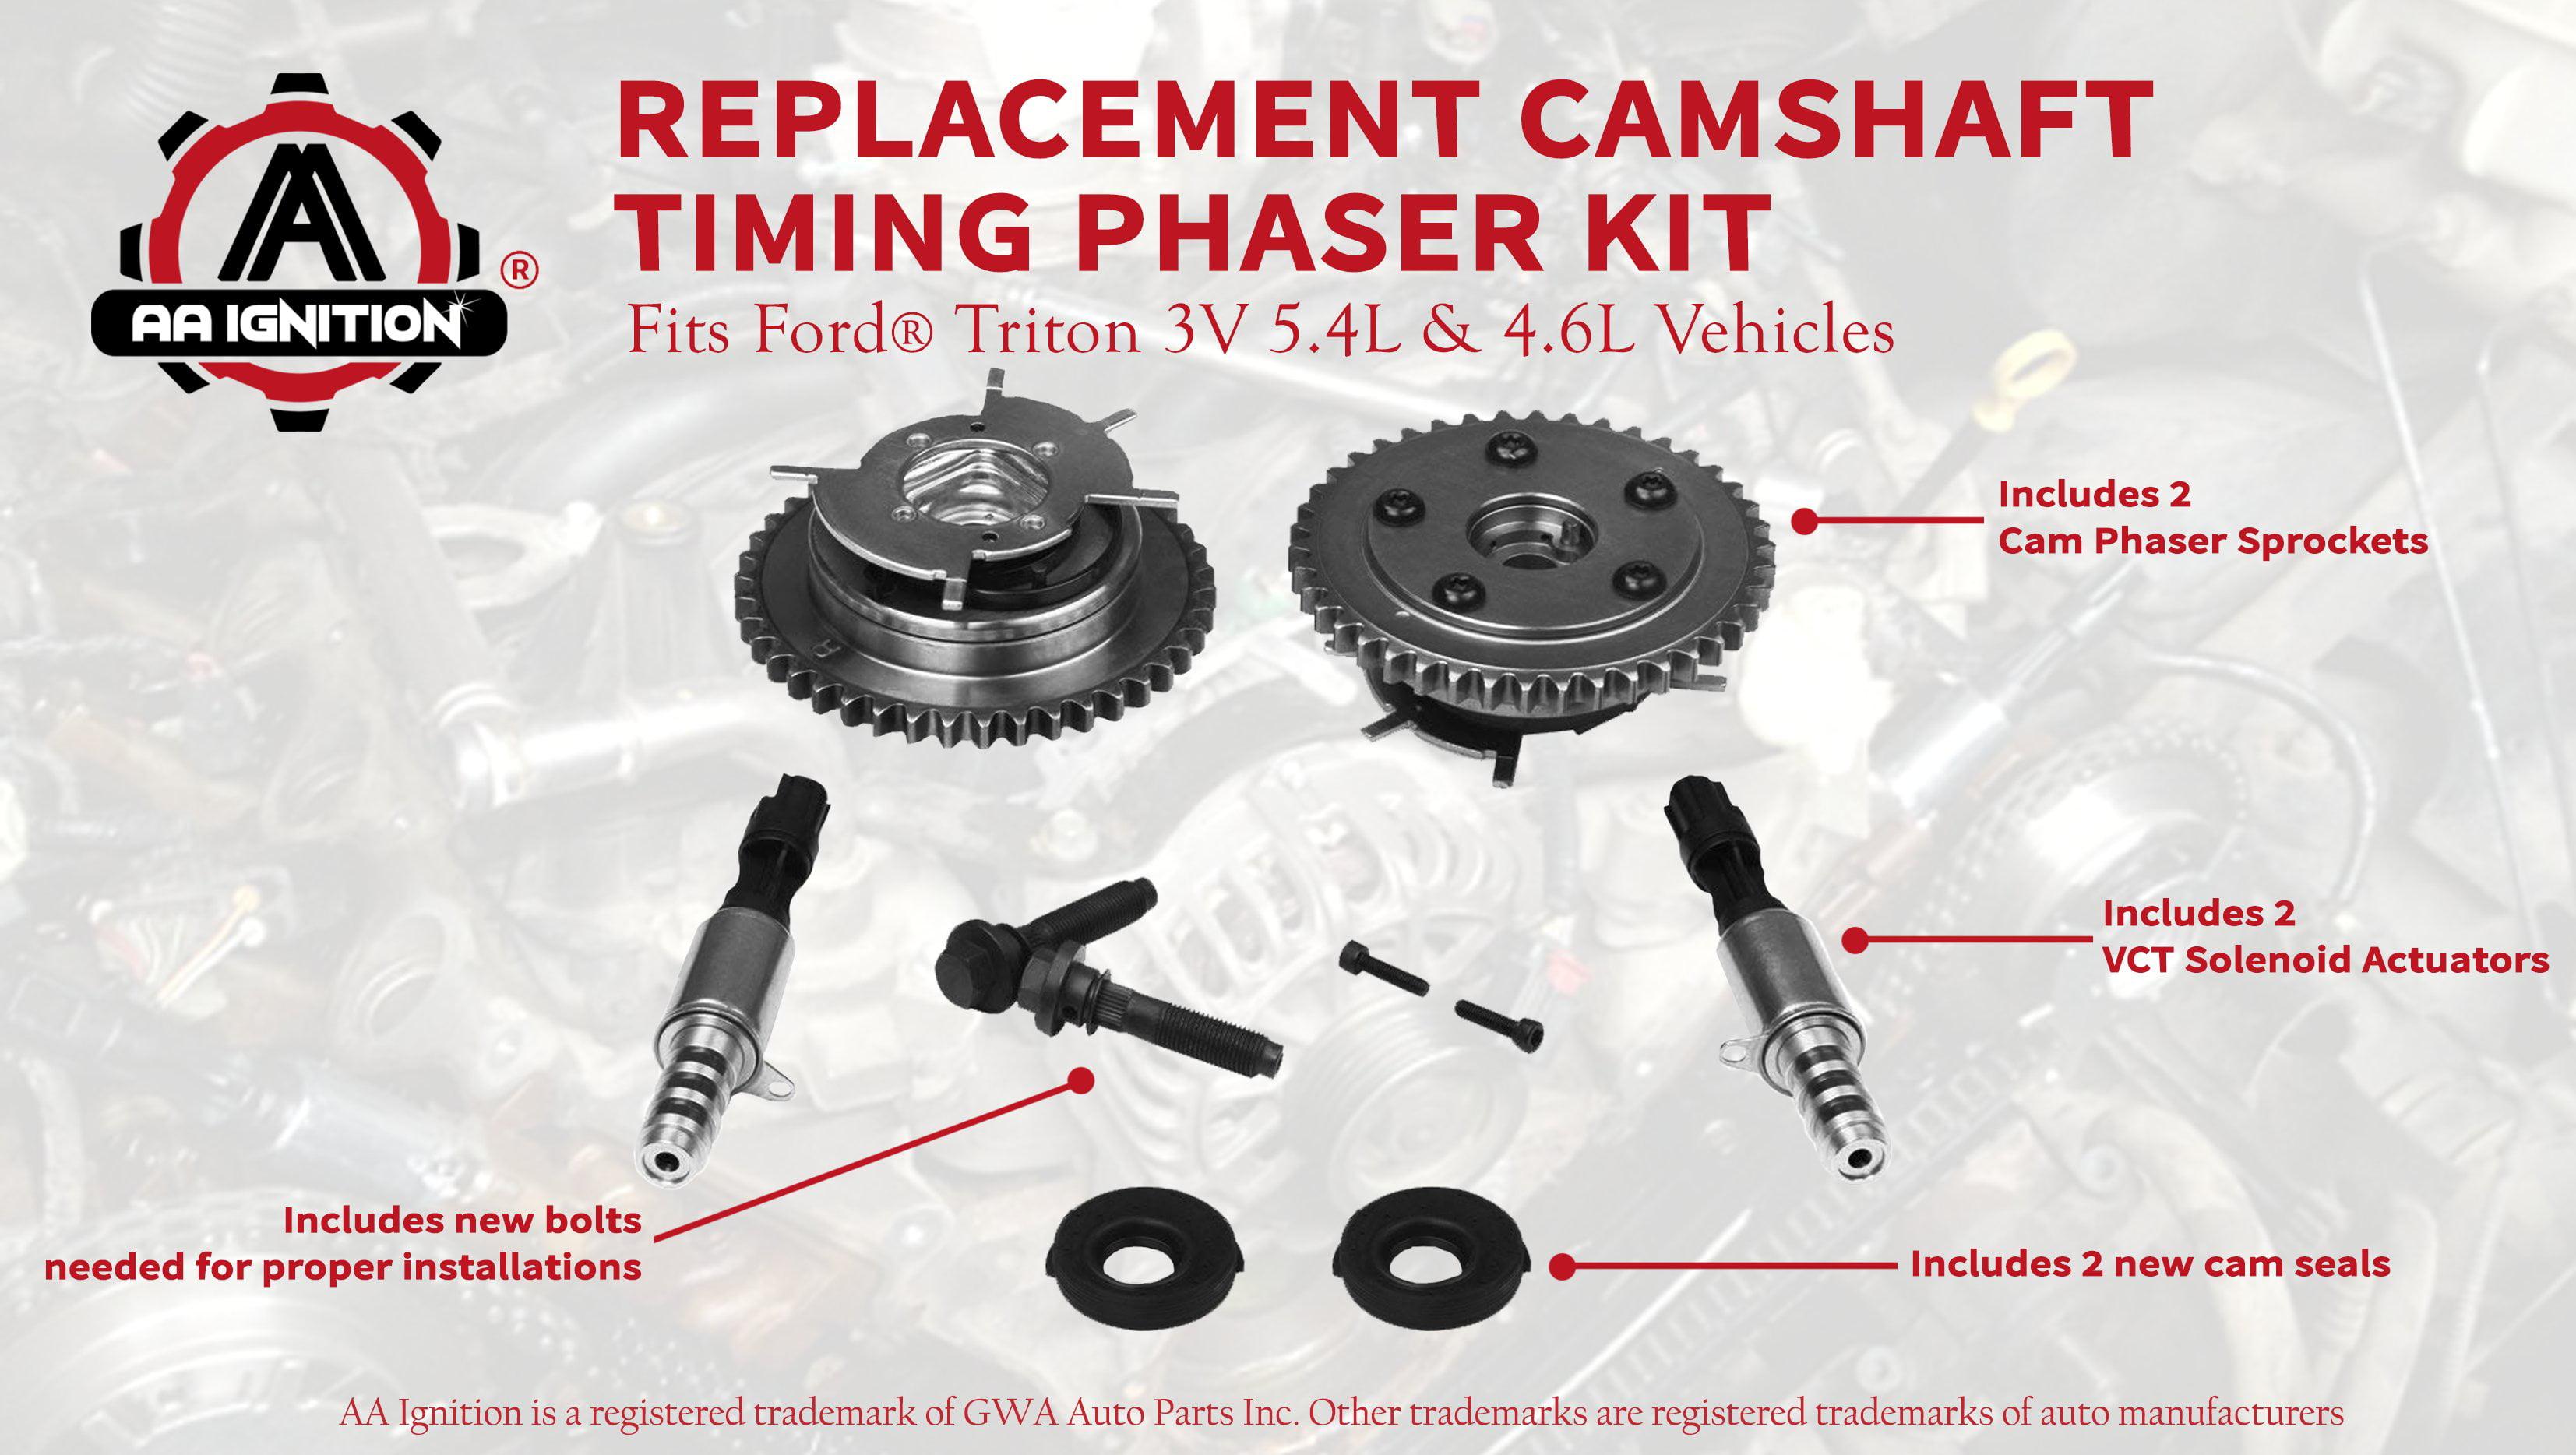 Variable Camshaft Timing Cam Phaser Kit Replaces 3r2z6a257da 917 250 3l3z 6279 Dap 8l3z 6m280 B Fits Ford F 150 Expedition More Triton